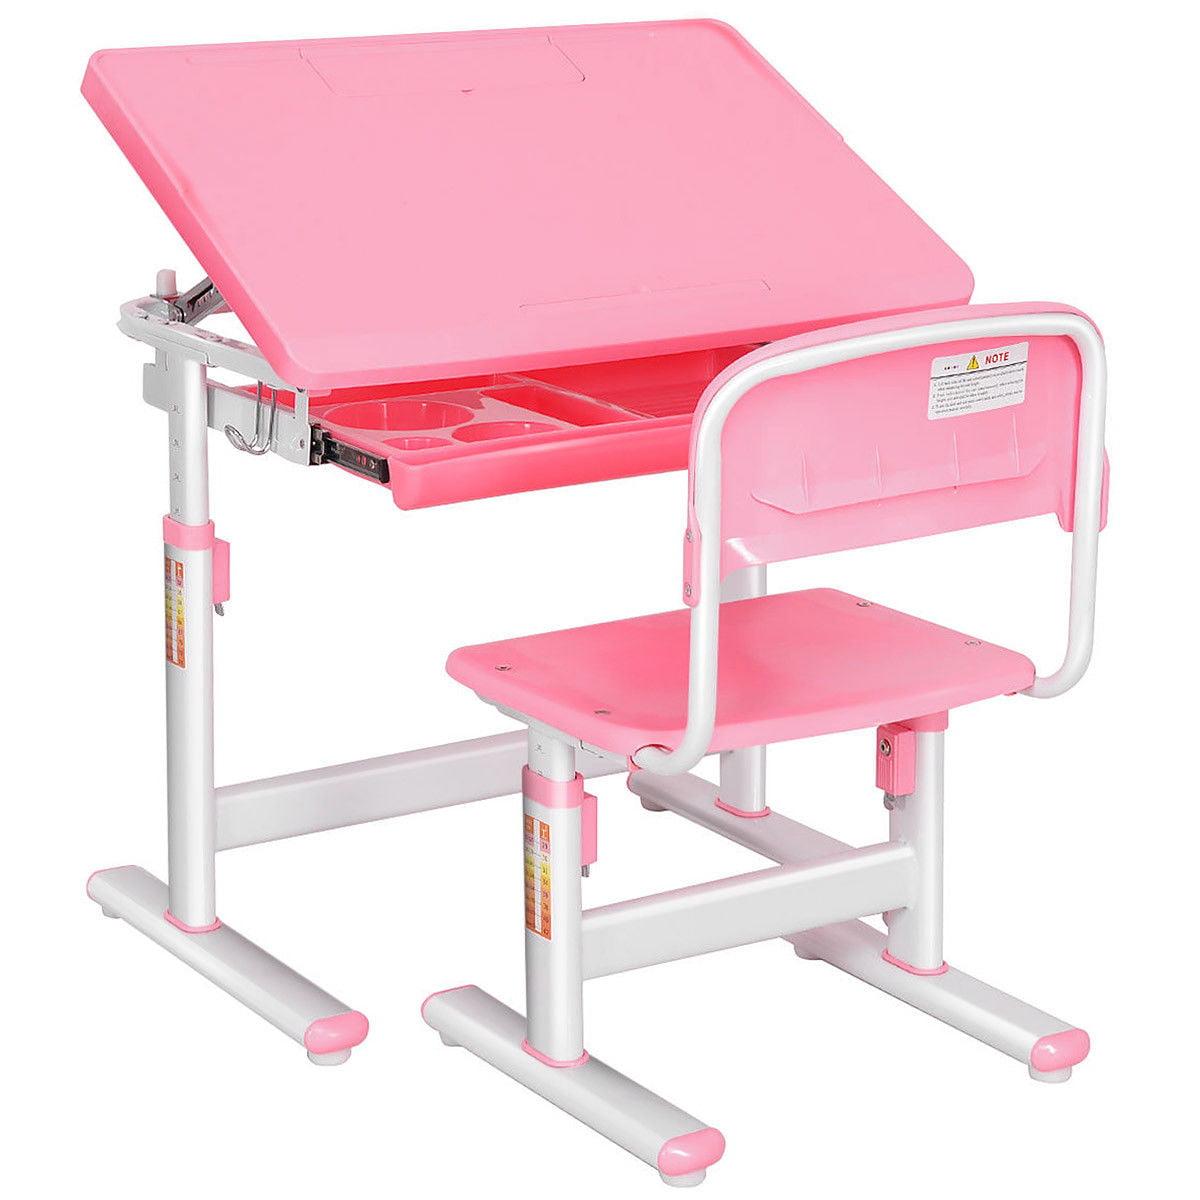 Costway Children Desk & Chair Set Height Adjustable Student Study Kids Work Station Pink